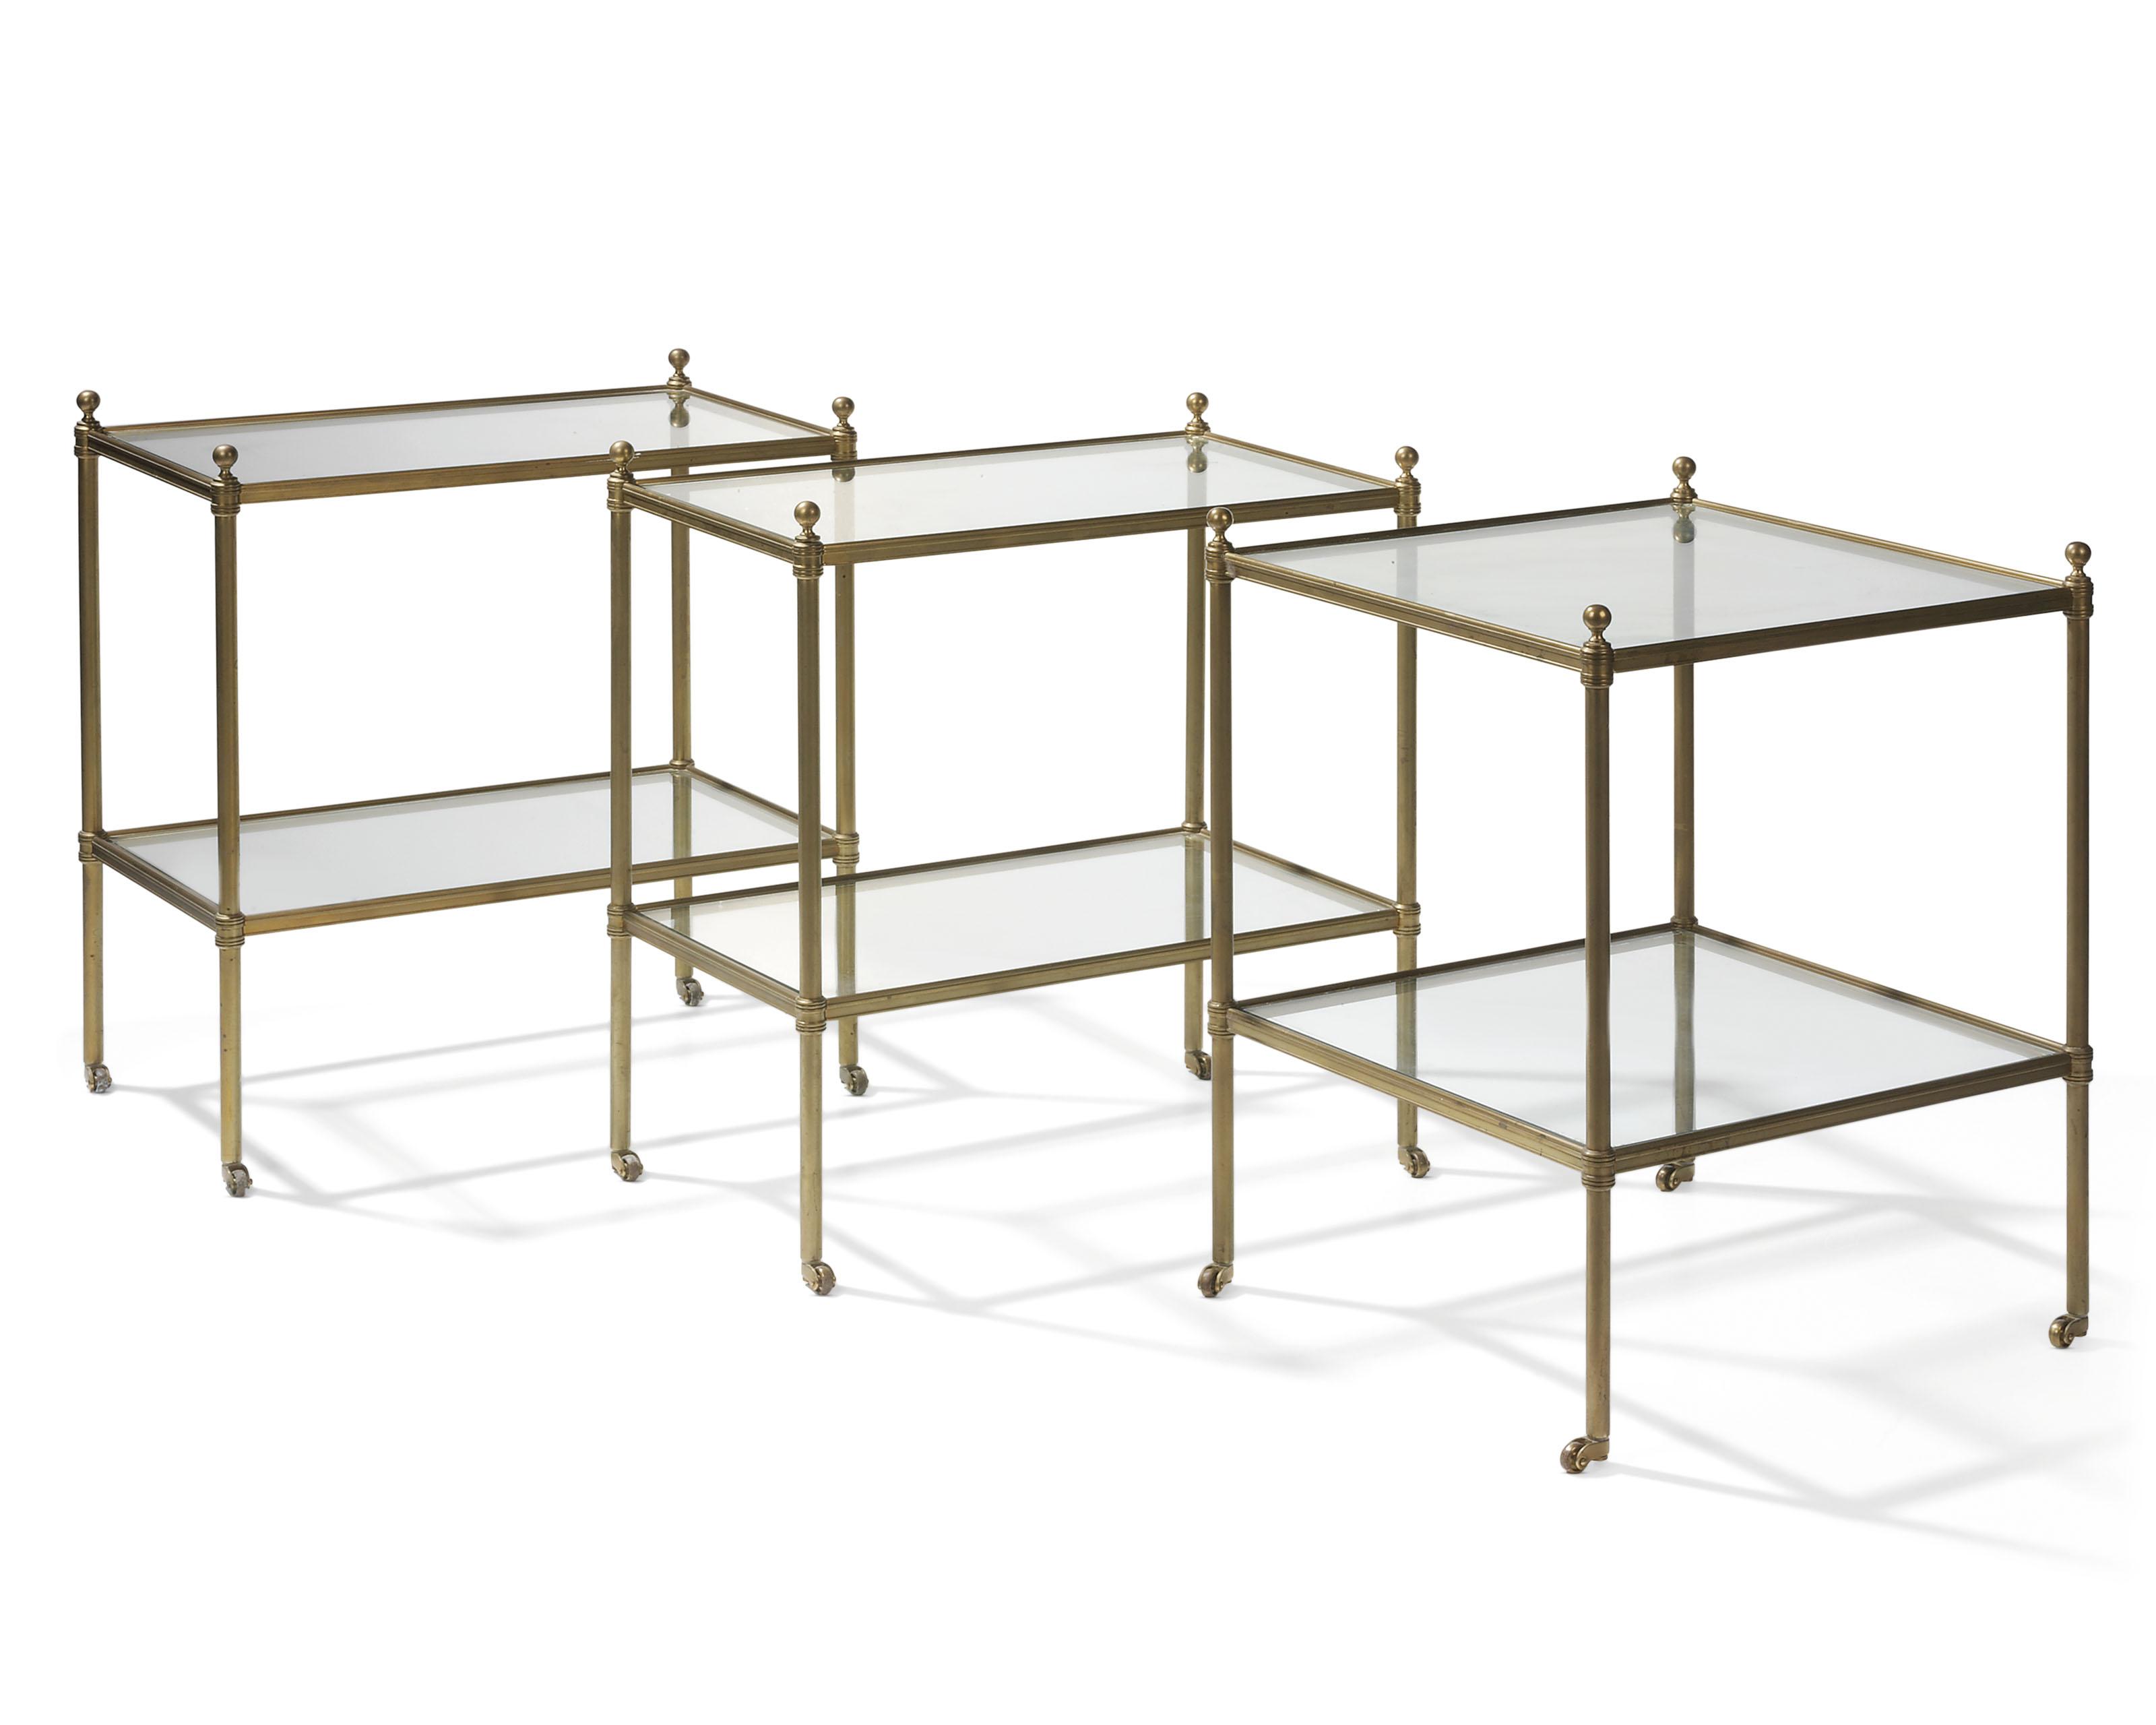 NEUN WELTEN Elegant Clothes Rail with Basket Shelf and Wheels 100 x 34 x 169 White